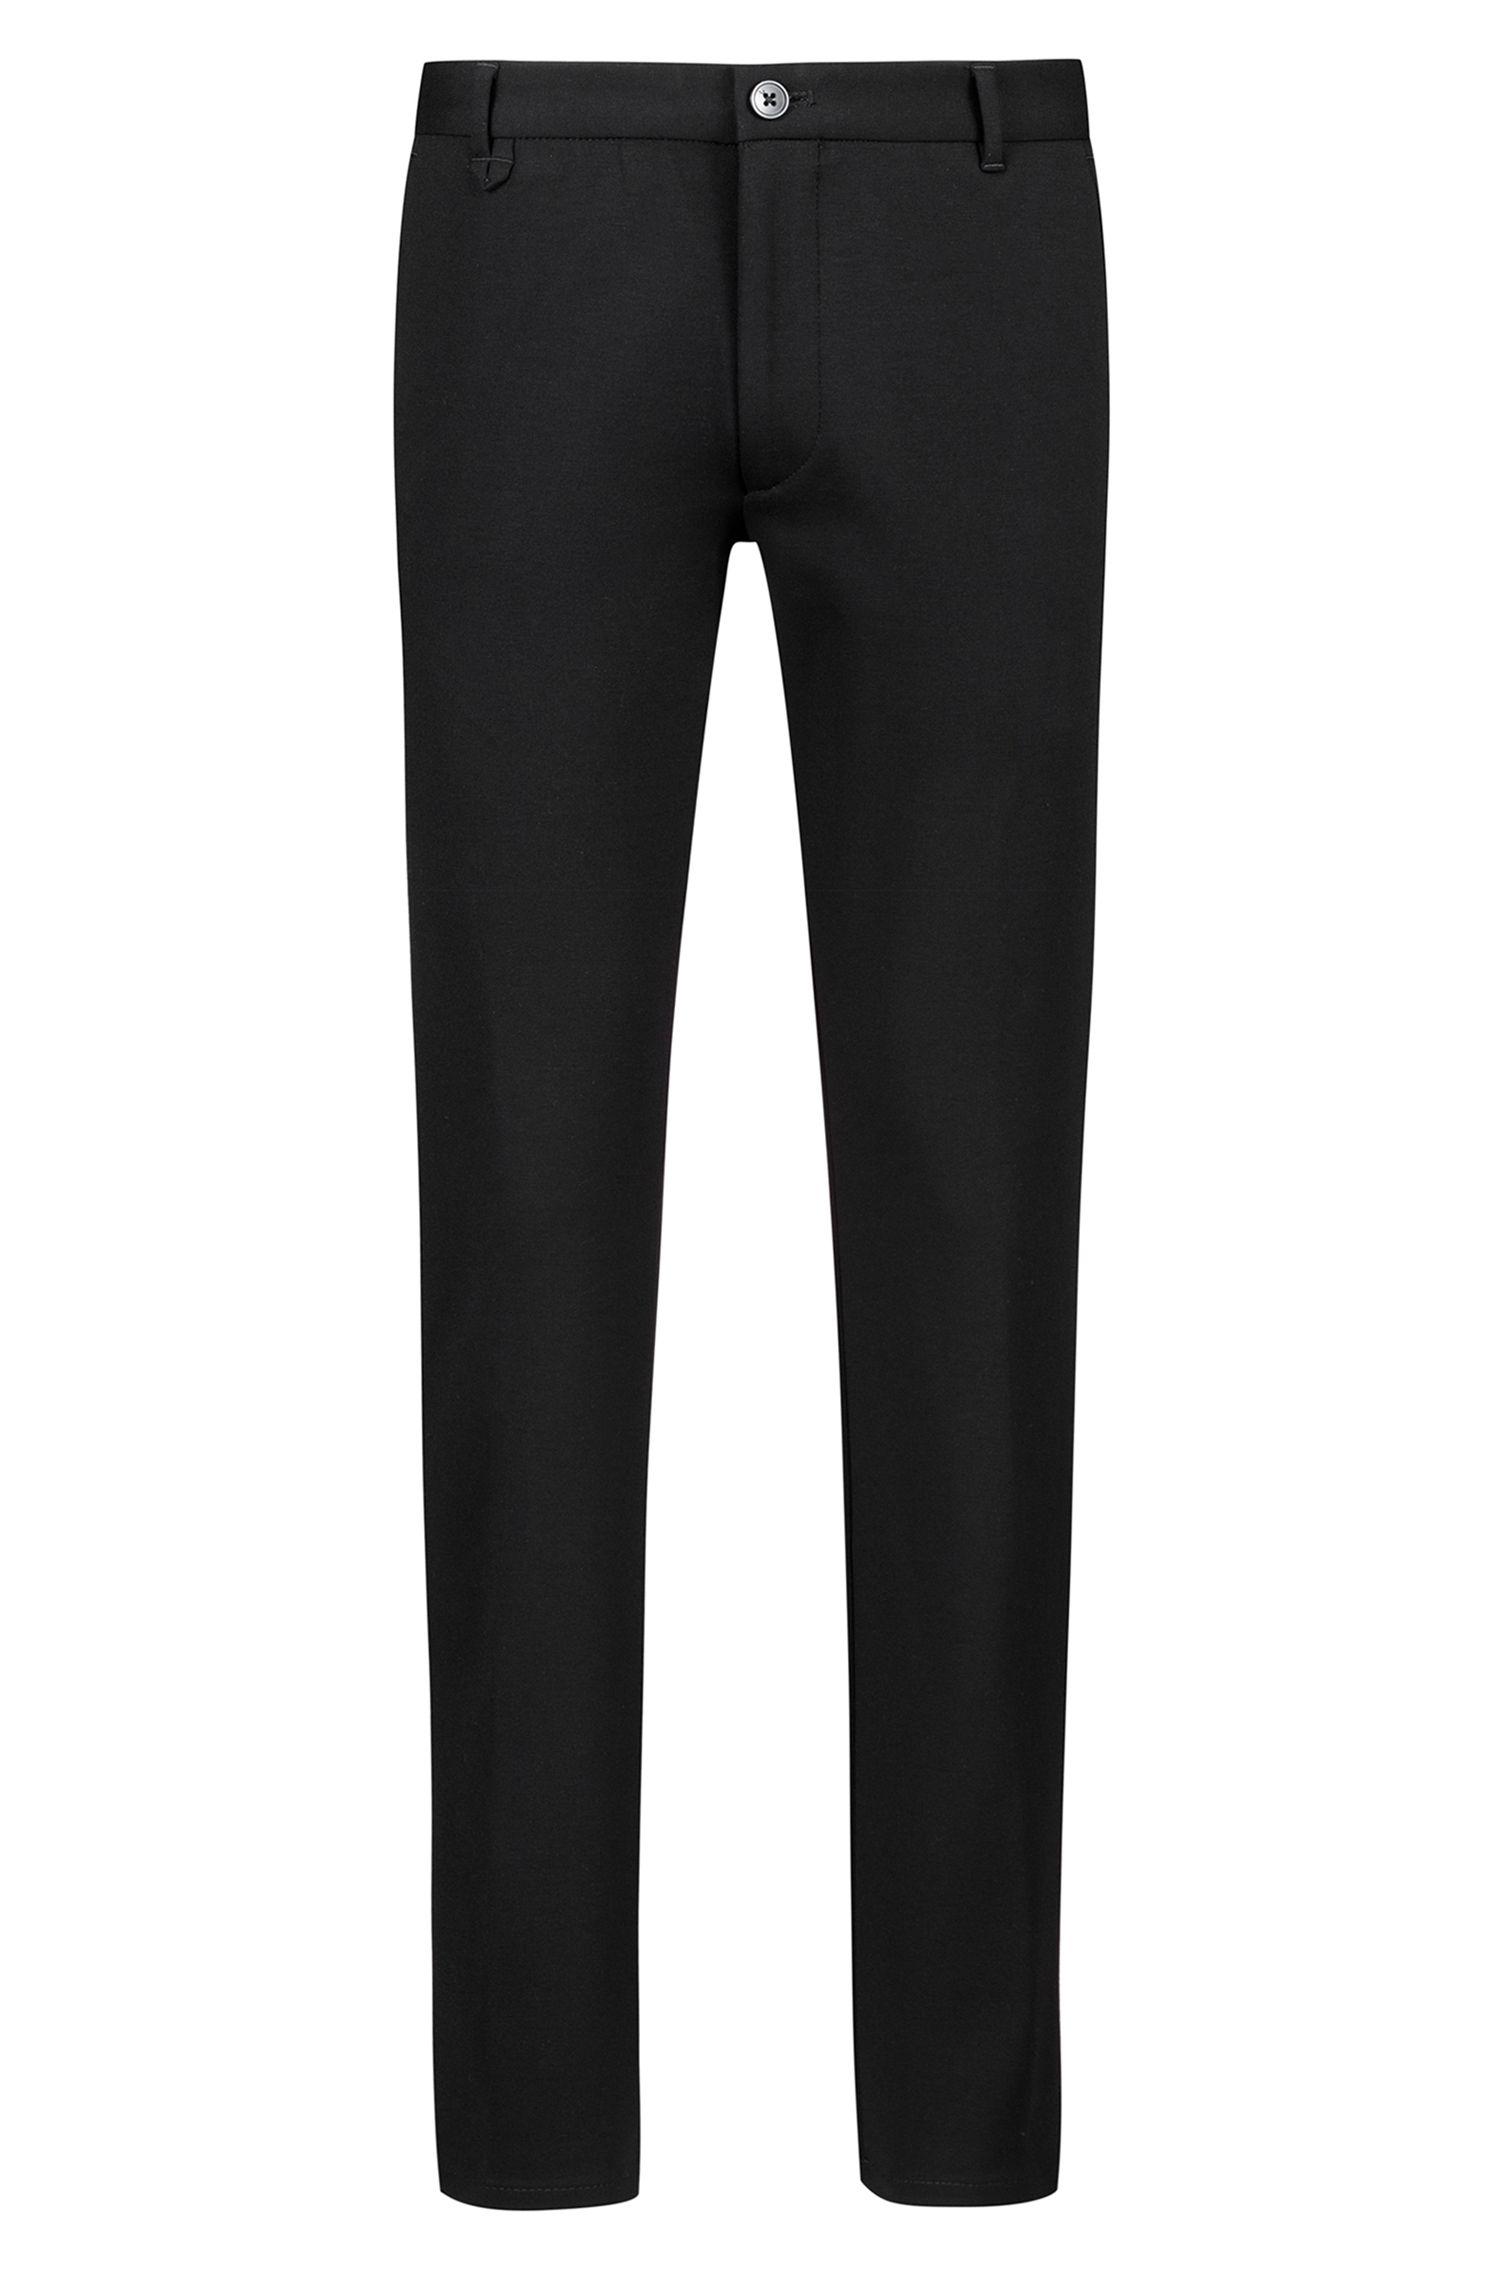 Extra-slim-fit stretch-jersey pants, Black